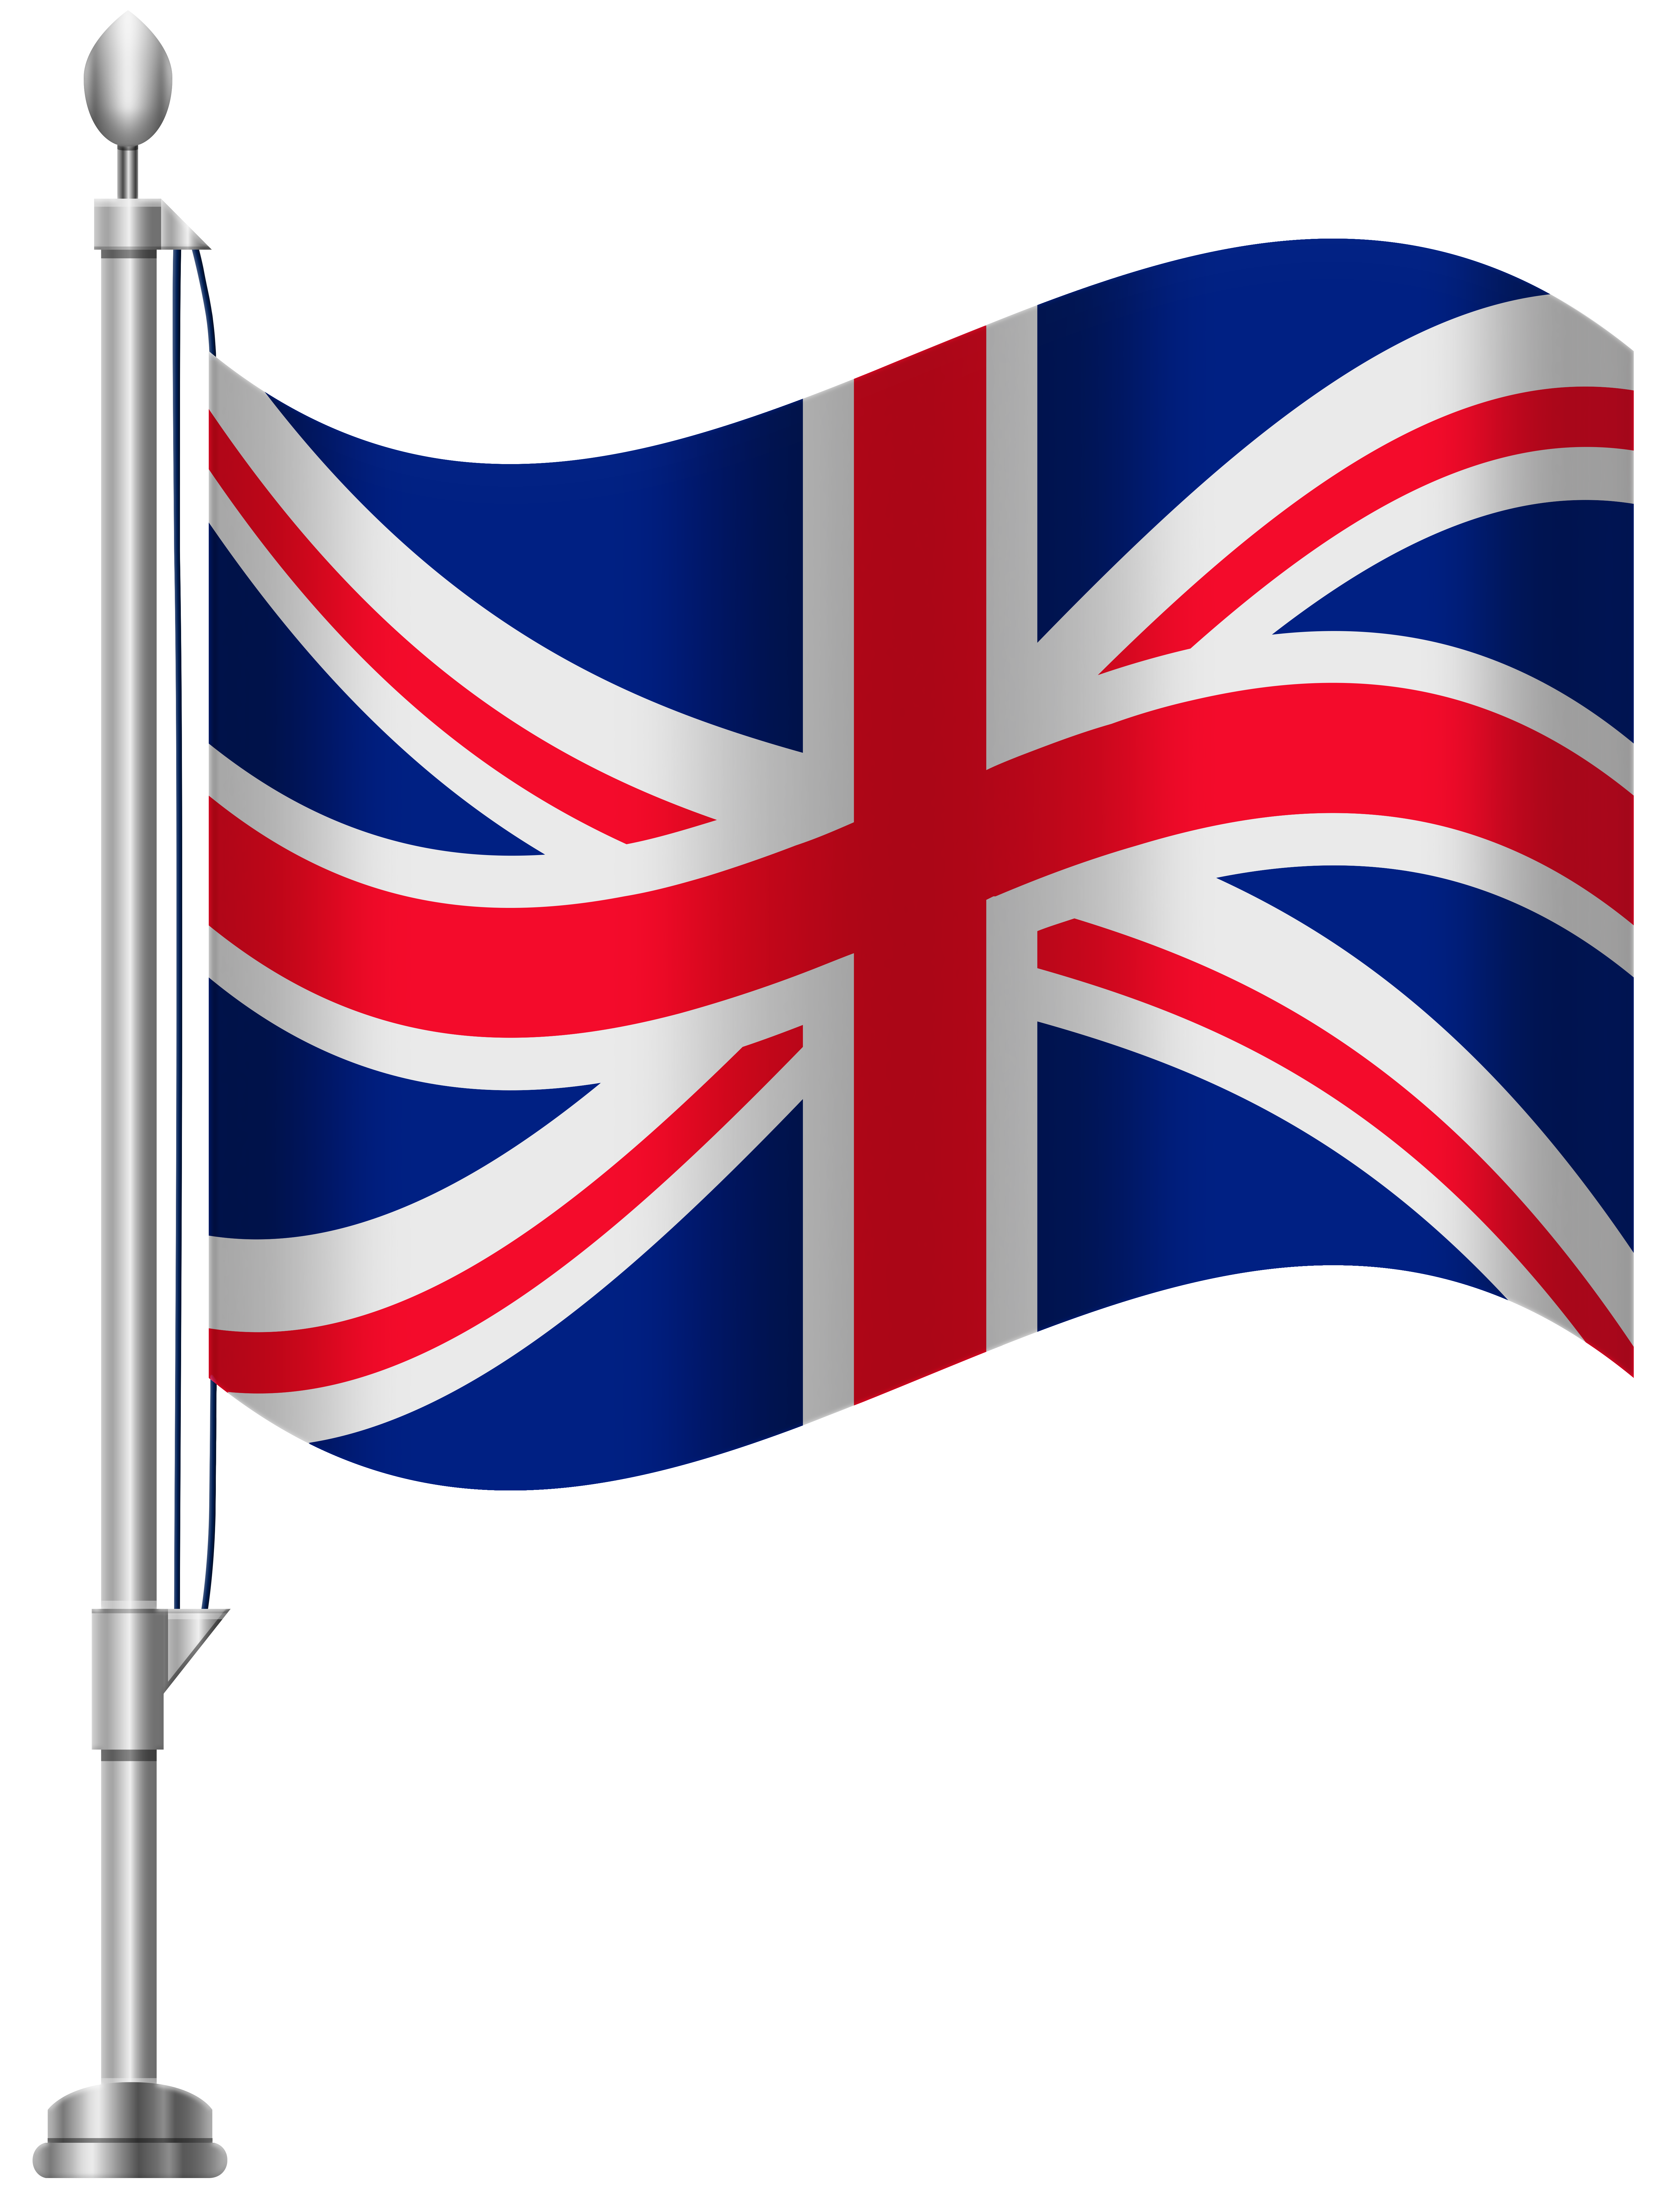 6141x8000 United Kingdom Flag Png Clip Art